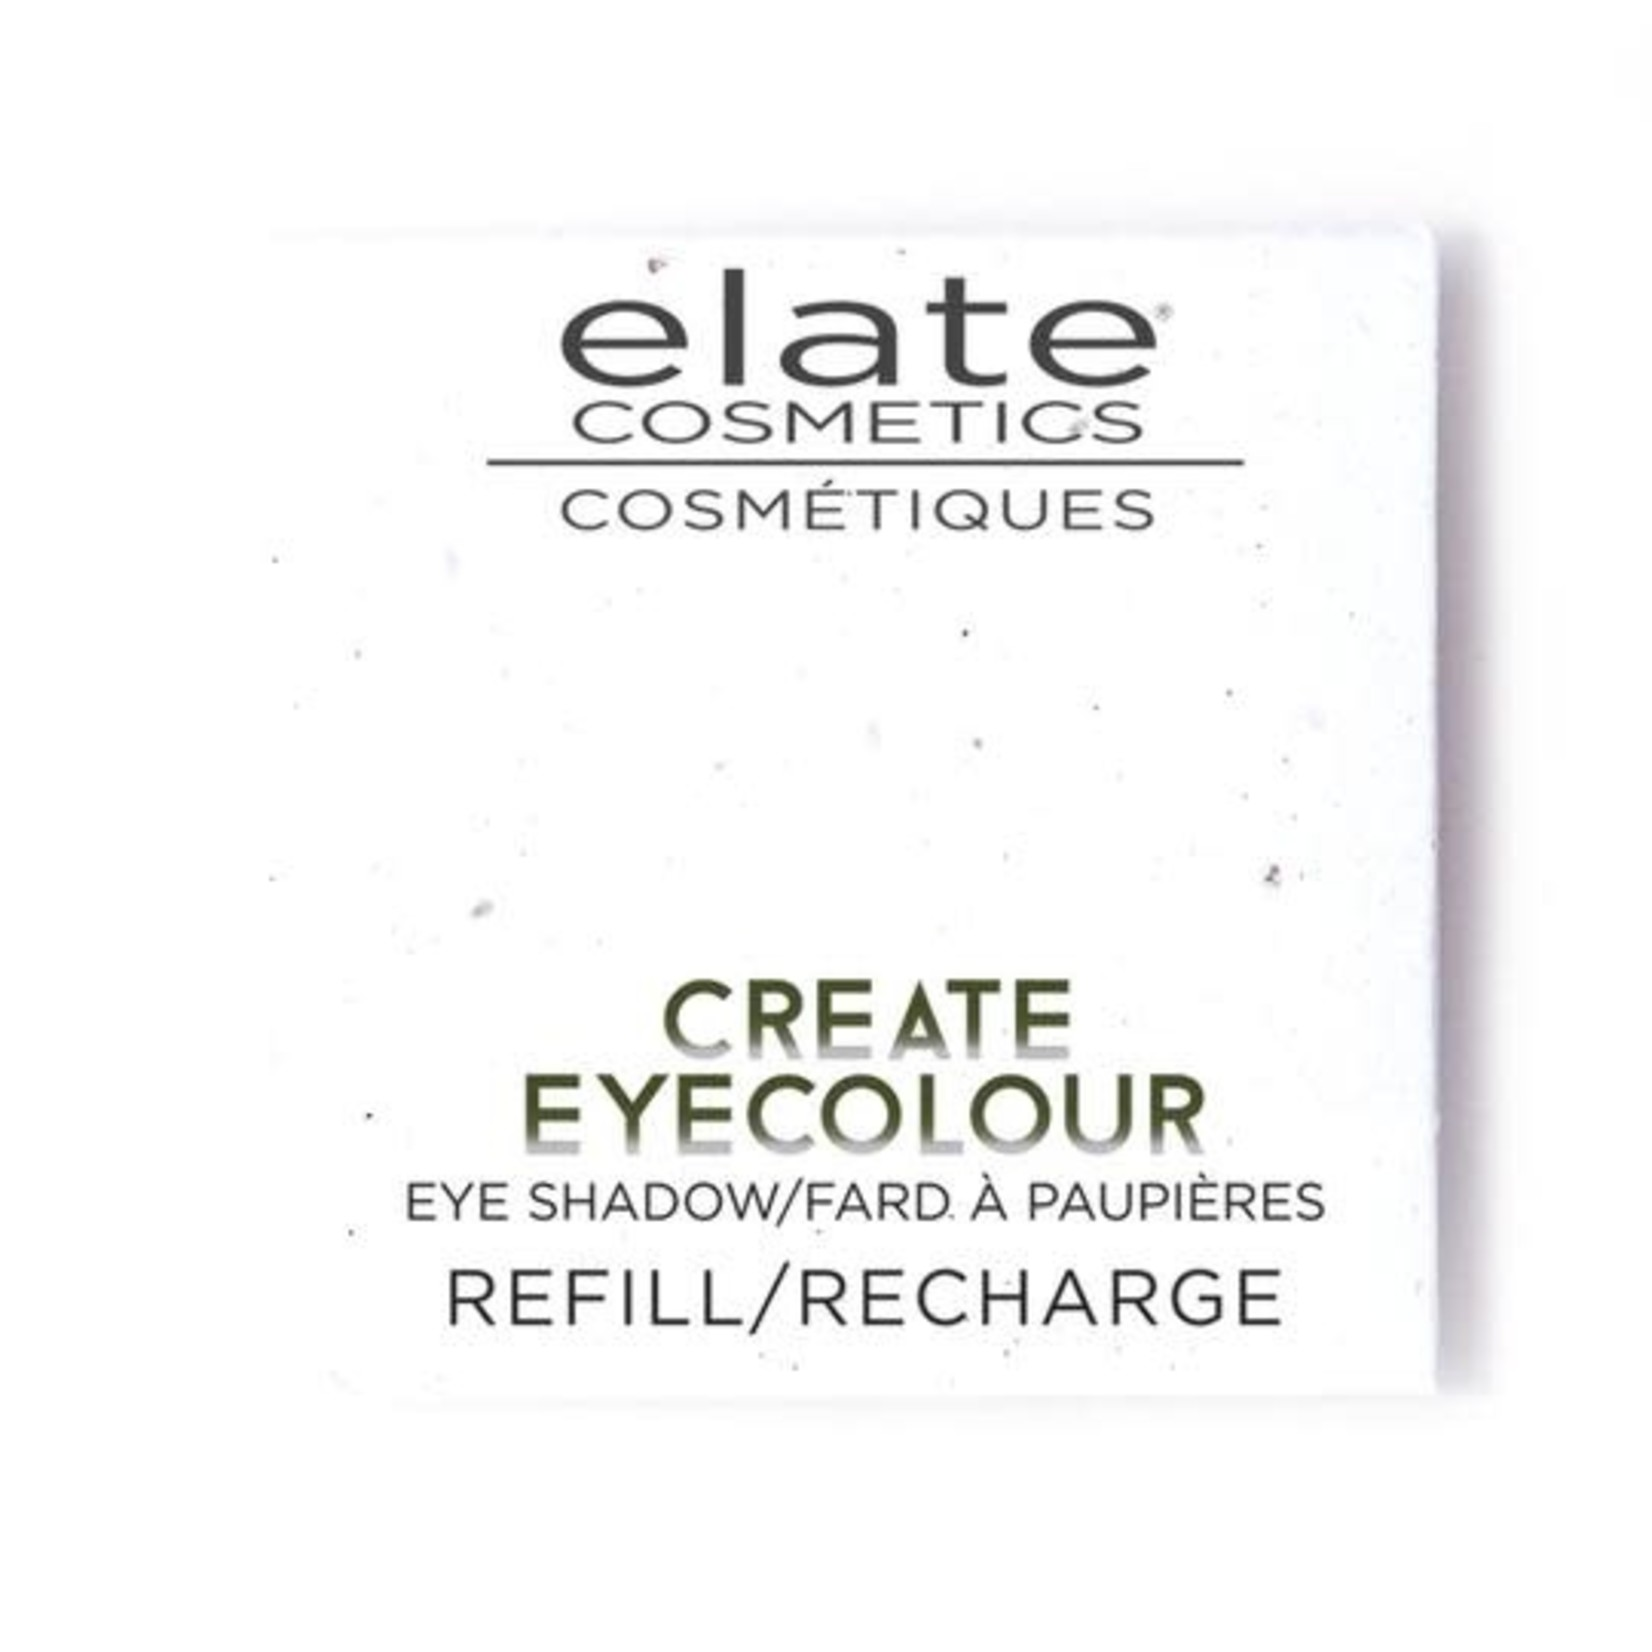 ELATE COSMETICS PRESSED EYECOLOUR - SURGE